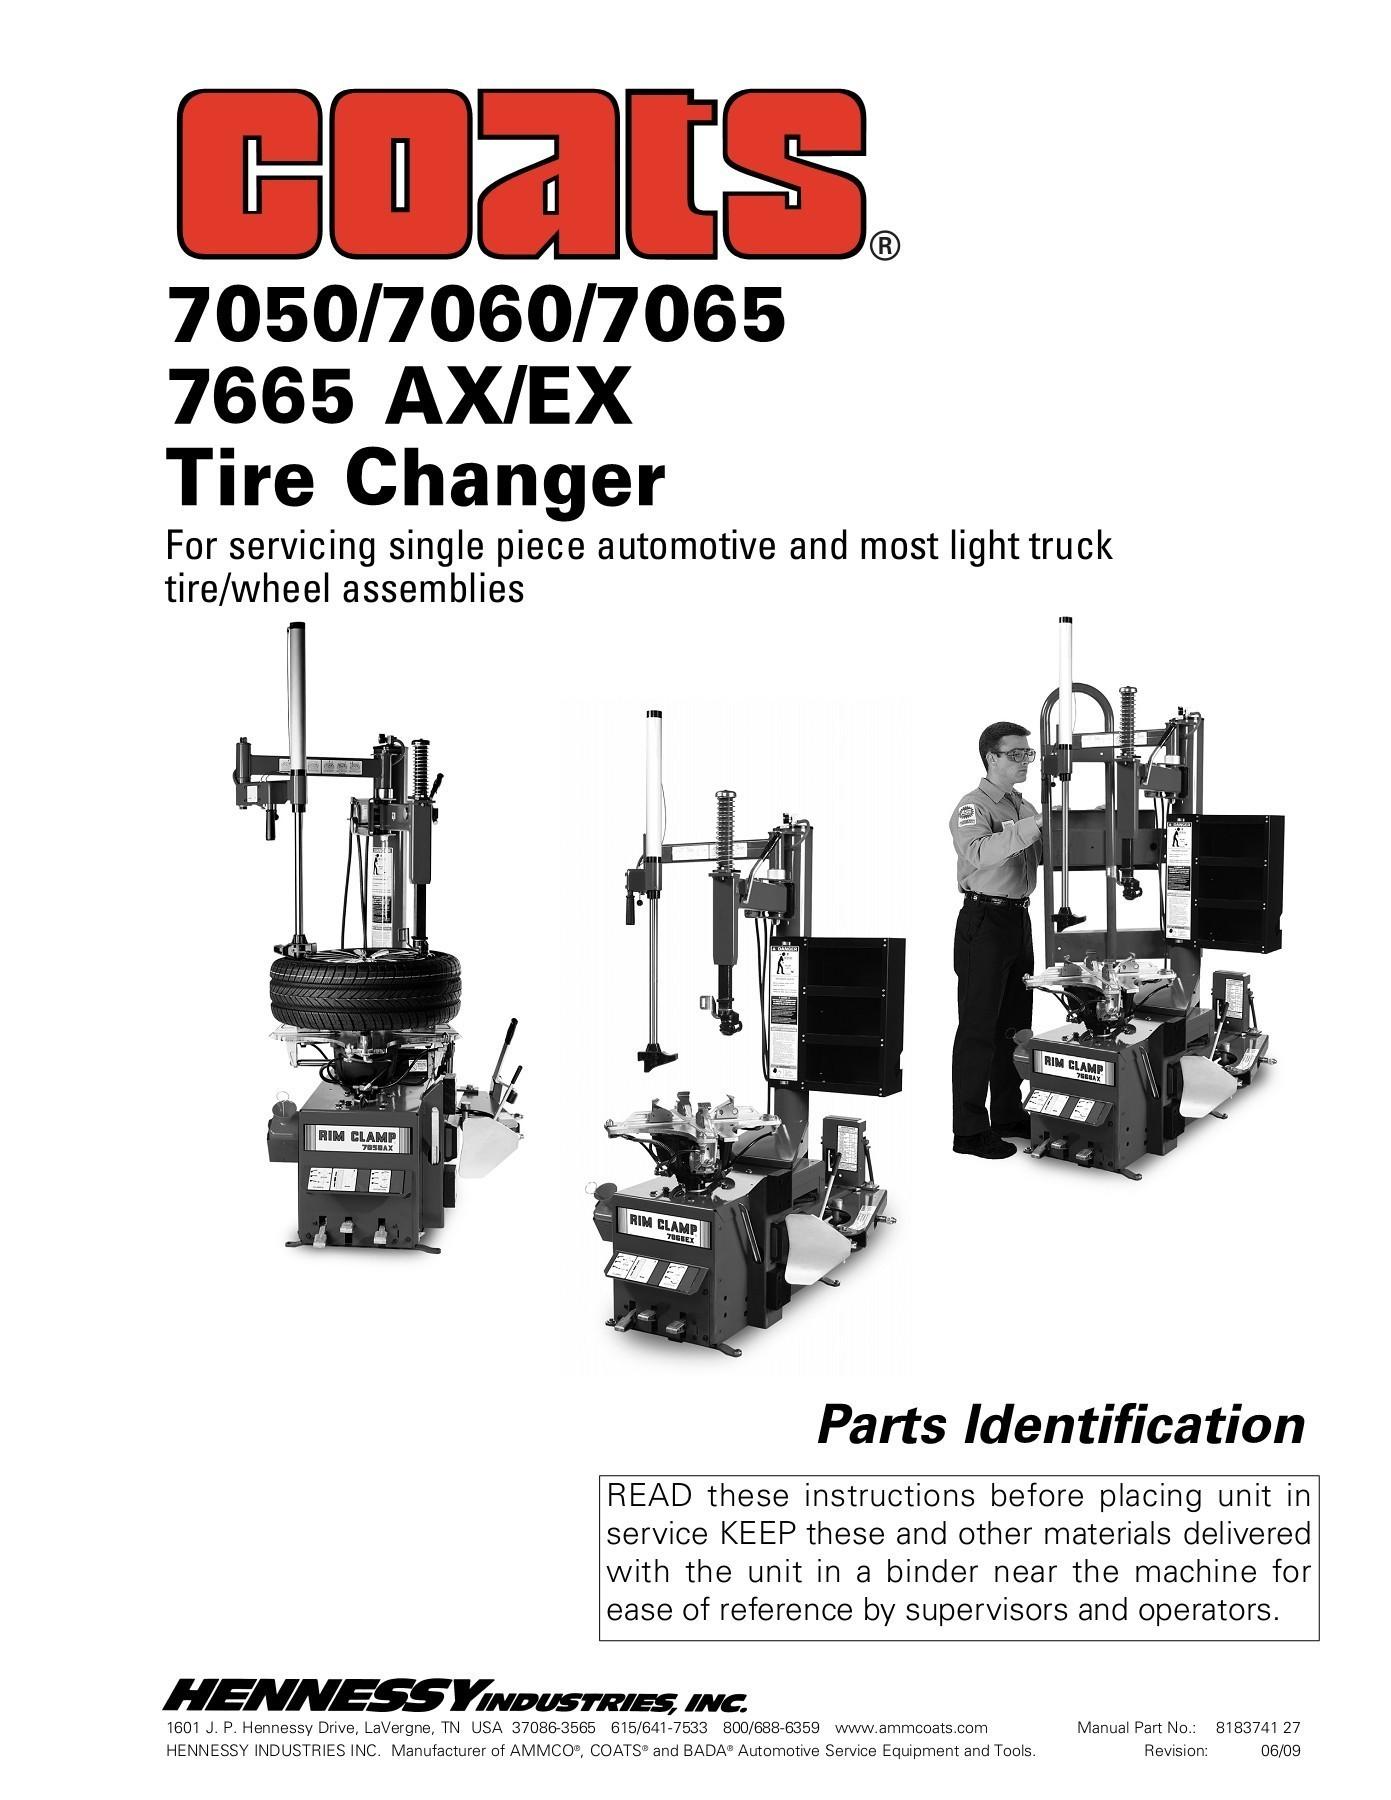 Tire Changer Schematic Wiring Coats Tire Machine Parts Diagram Of Tire Changer Schematic Wiring